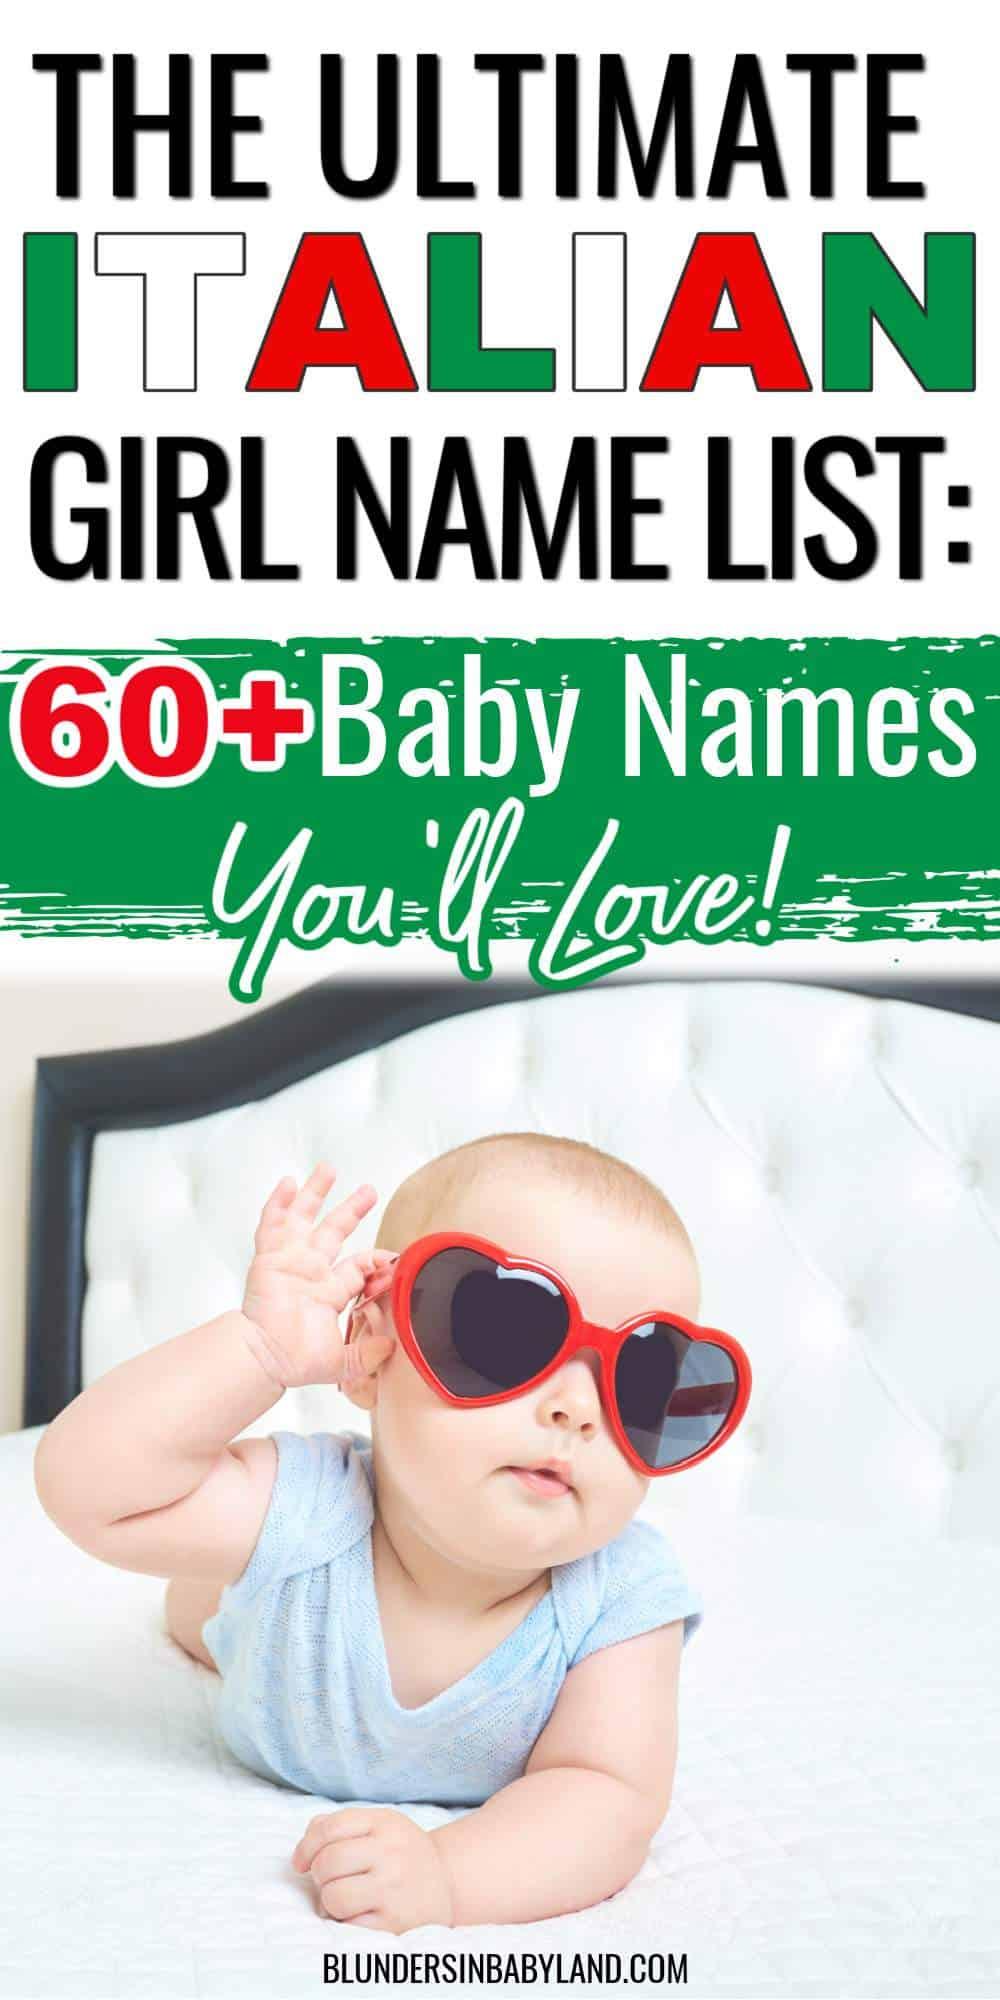 Italian Girl Name List - Italian Baby Names - Baby Names from Italy - Italian Names for Girls